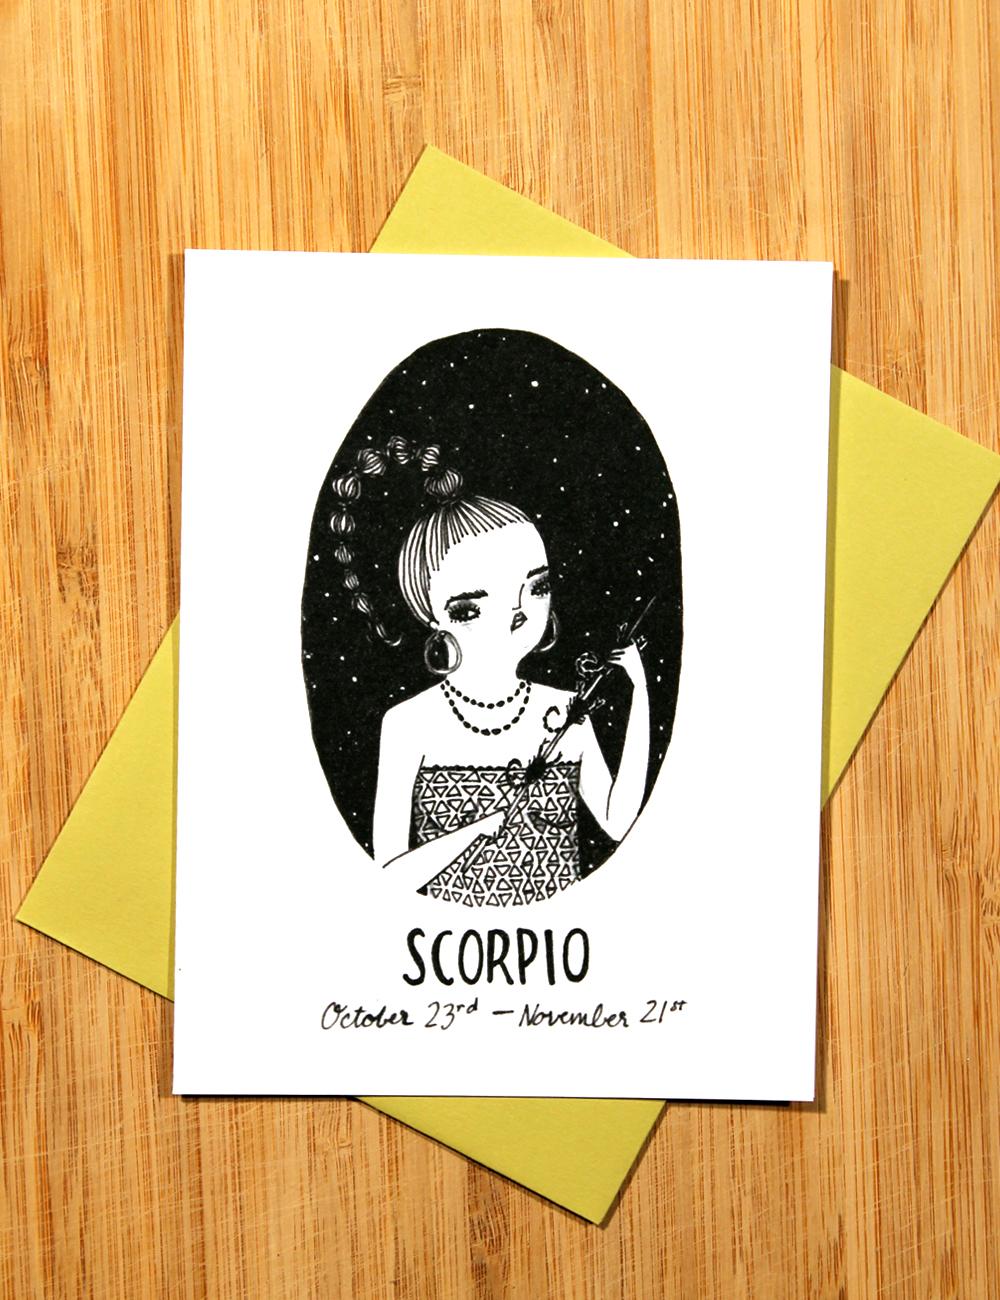 Scorpiocard.jpg